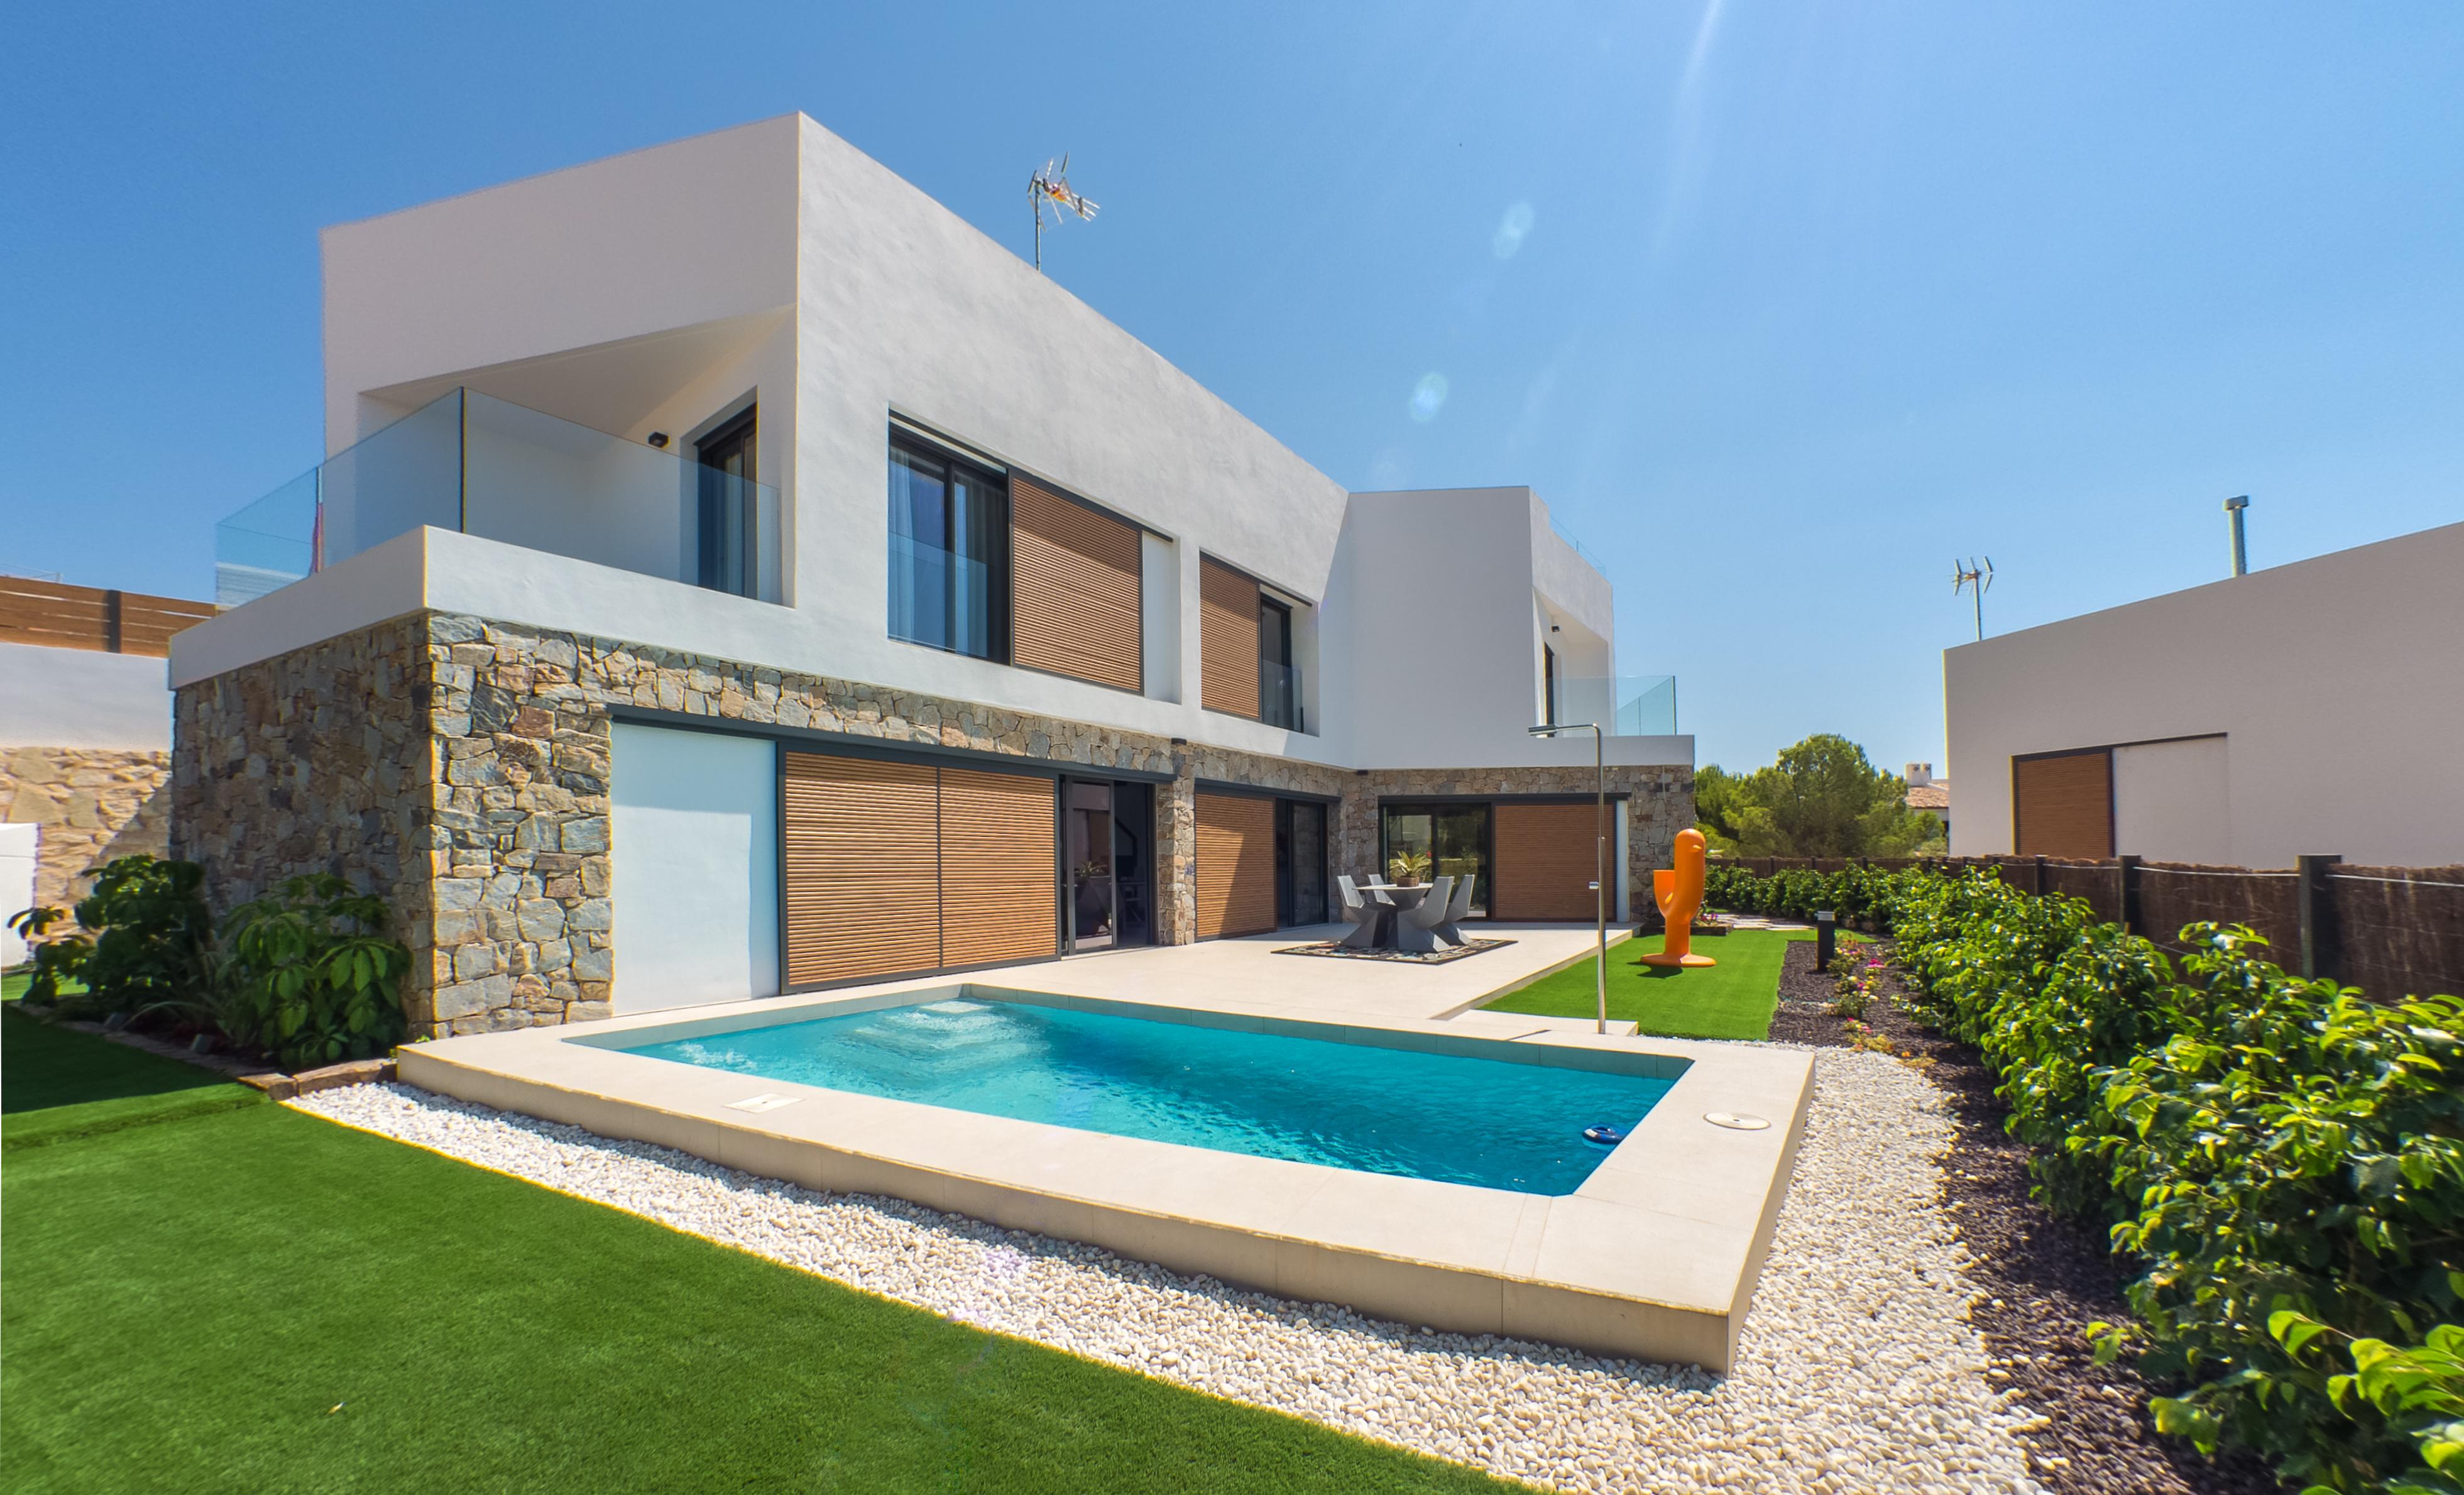 SPAIN COSTA BLANCA – Benidorm, luxury villas with basement, pool and amazing sea views